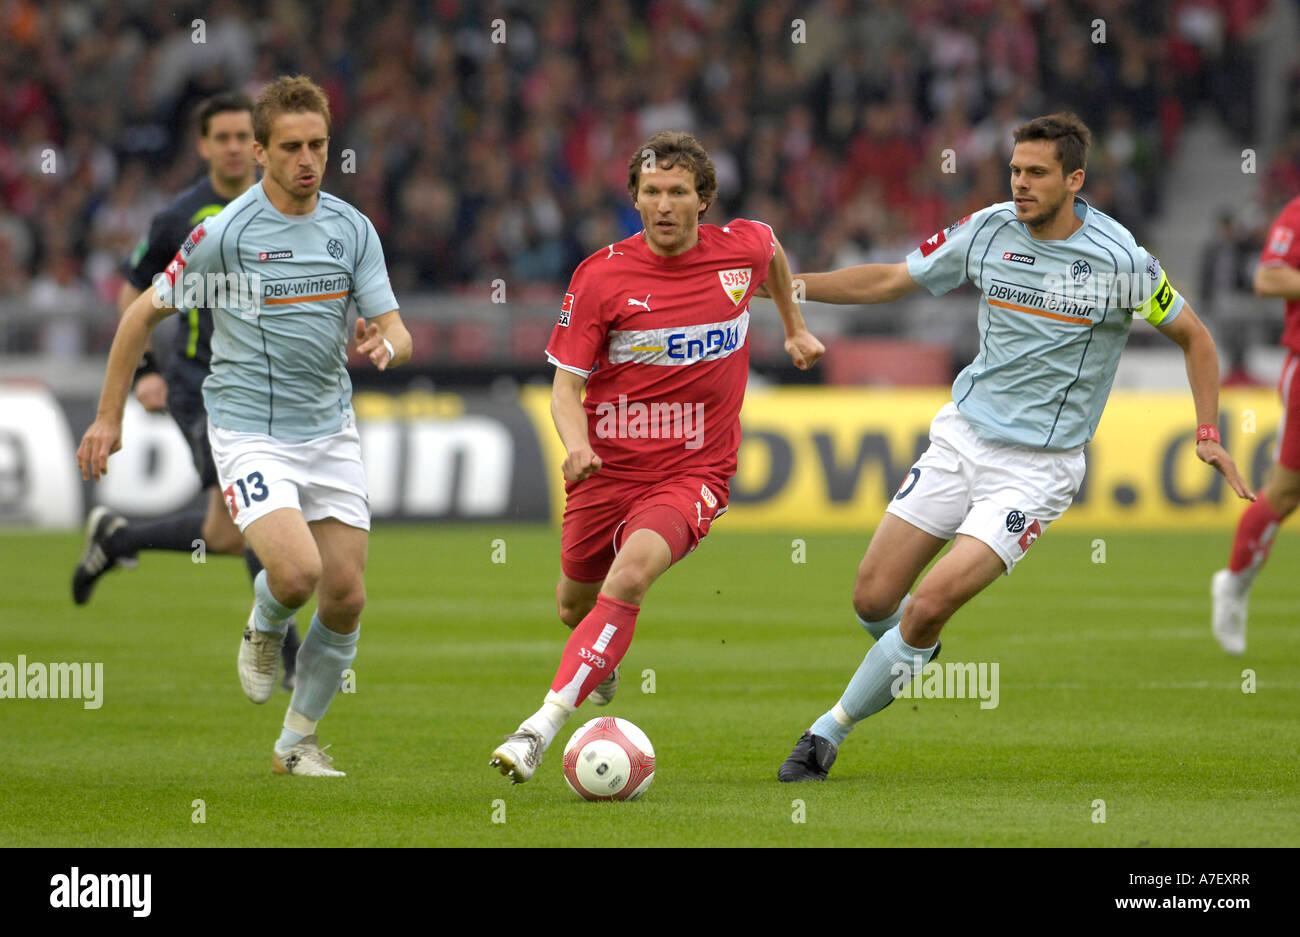 Milorad PEKOVIC (left) and Manuel FRIEDRICH (right) FSV Mainz 05 vs. Benjamin LAUTH VfB Stuttgart (middle) - Stock Image